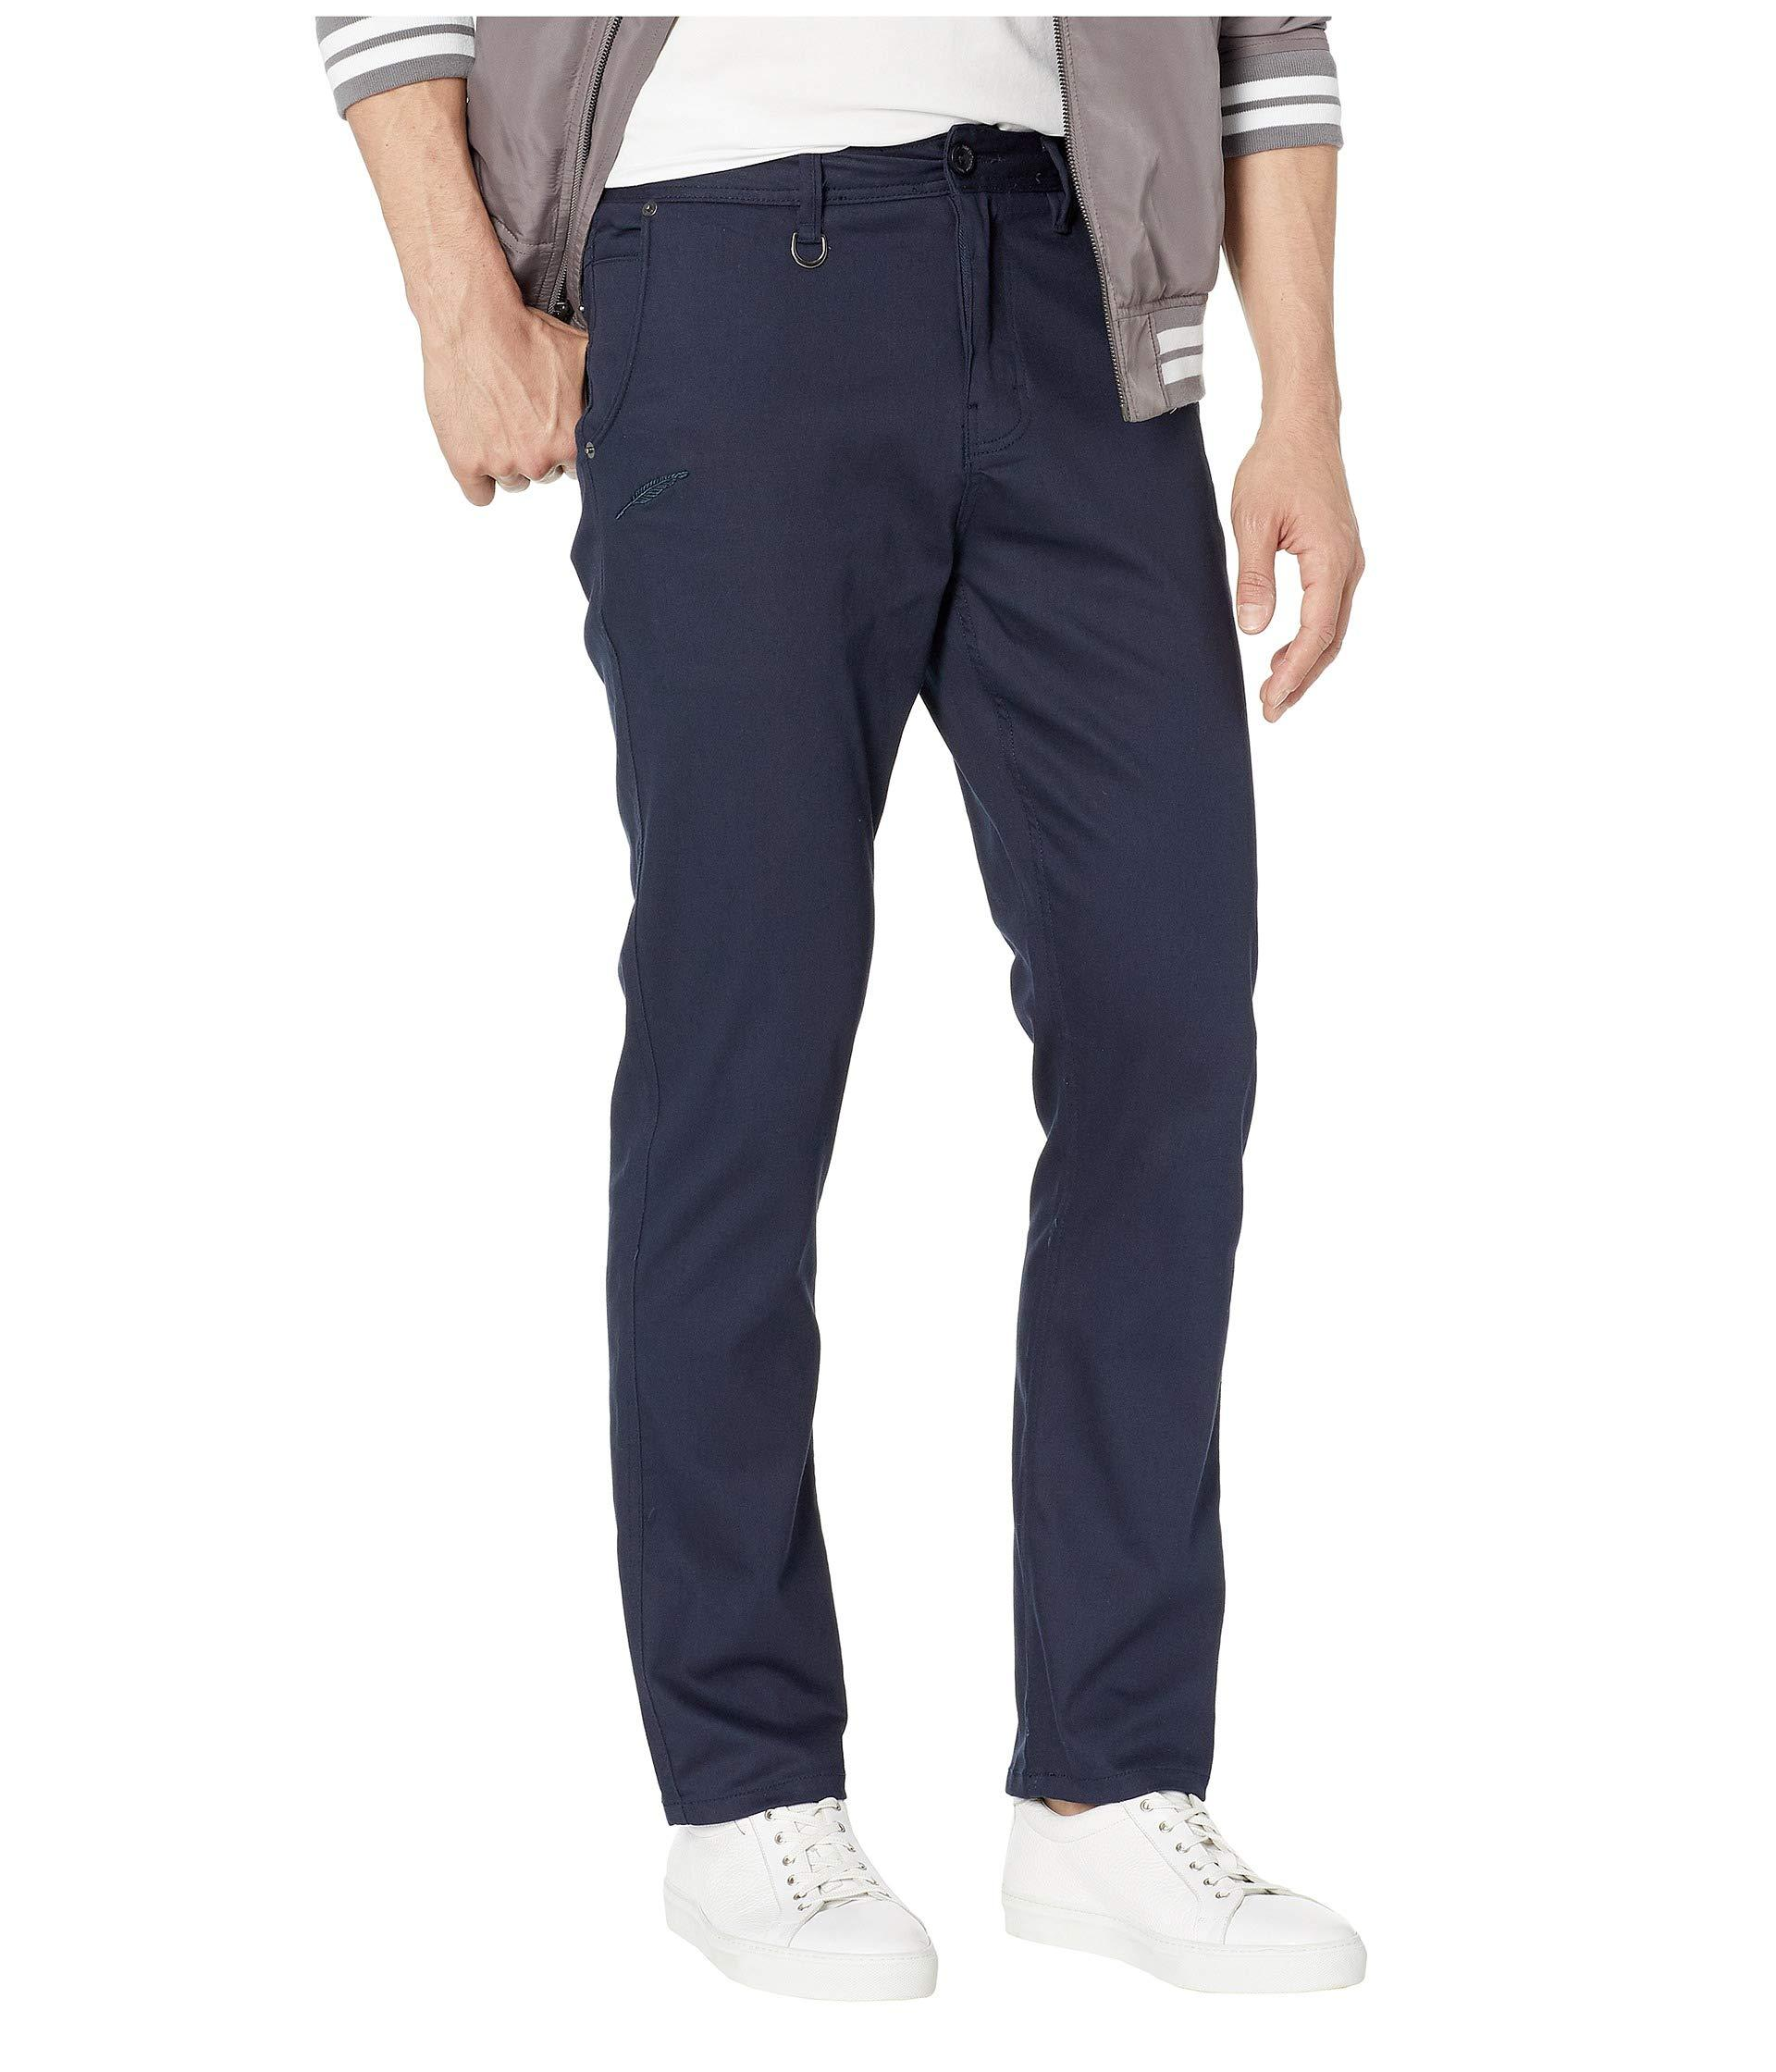 08824f4c9cd5 Lyst - Publish Index Classic Pants (navy) Men s Casual Pants in Blue ...